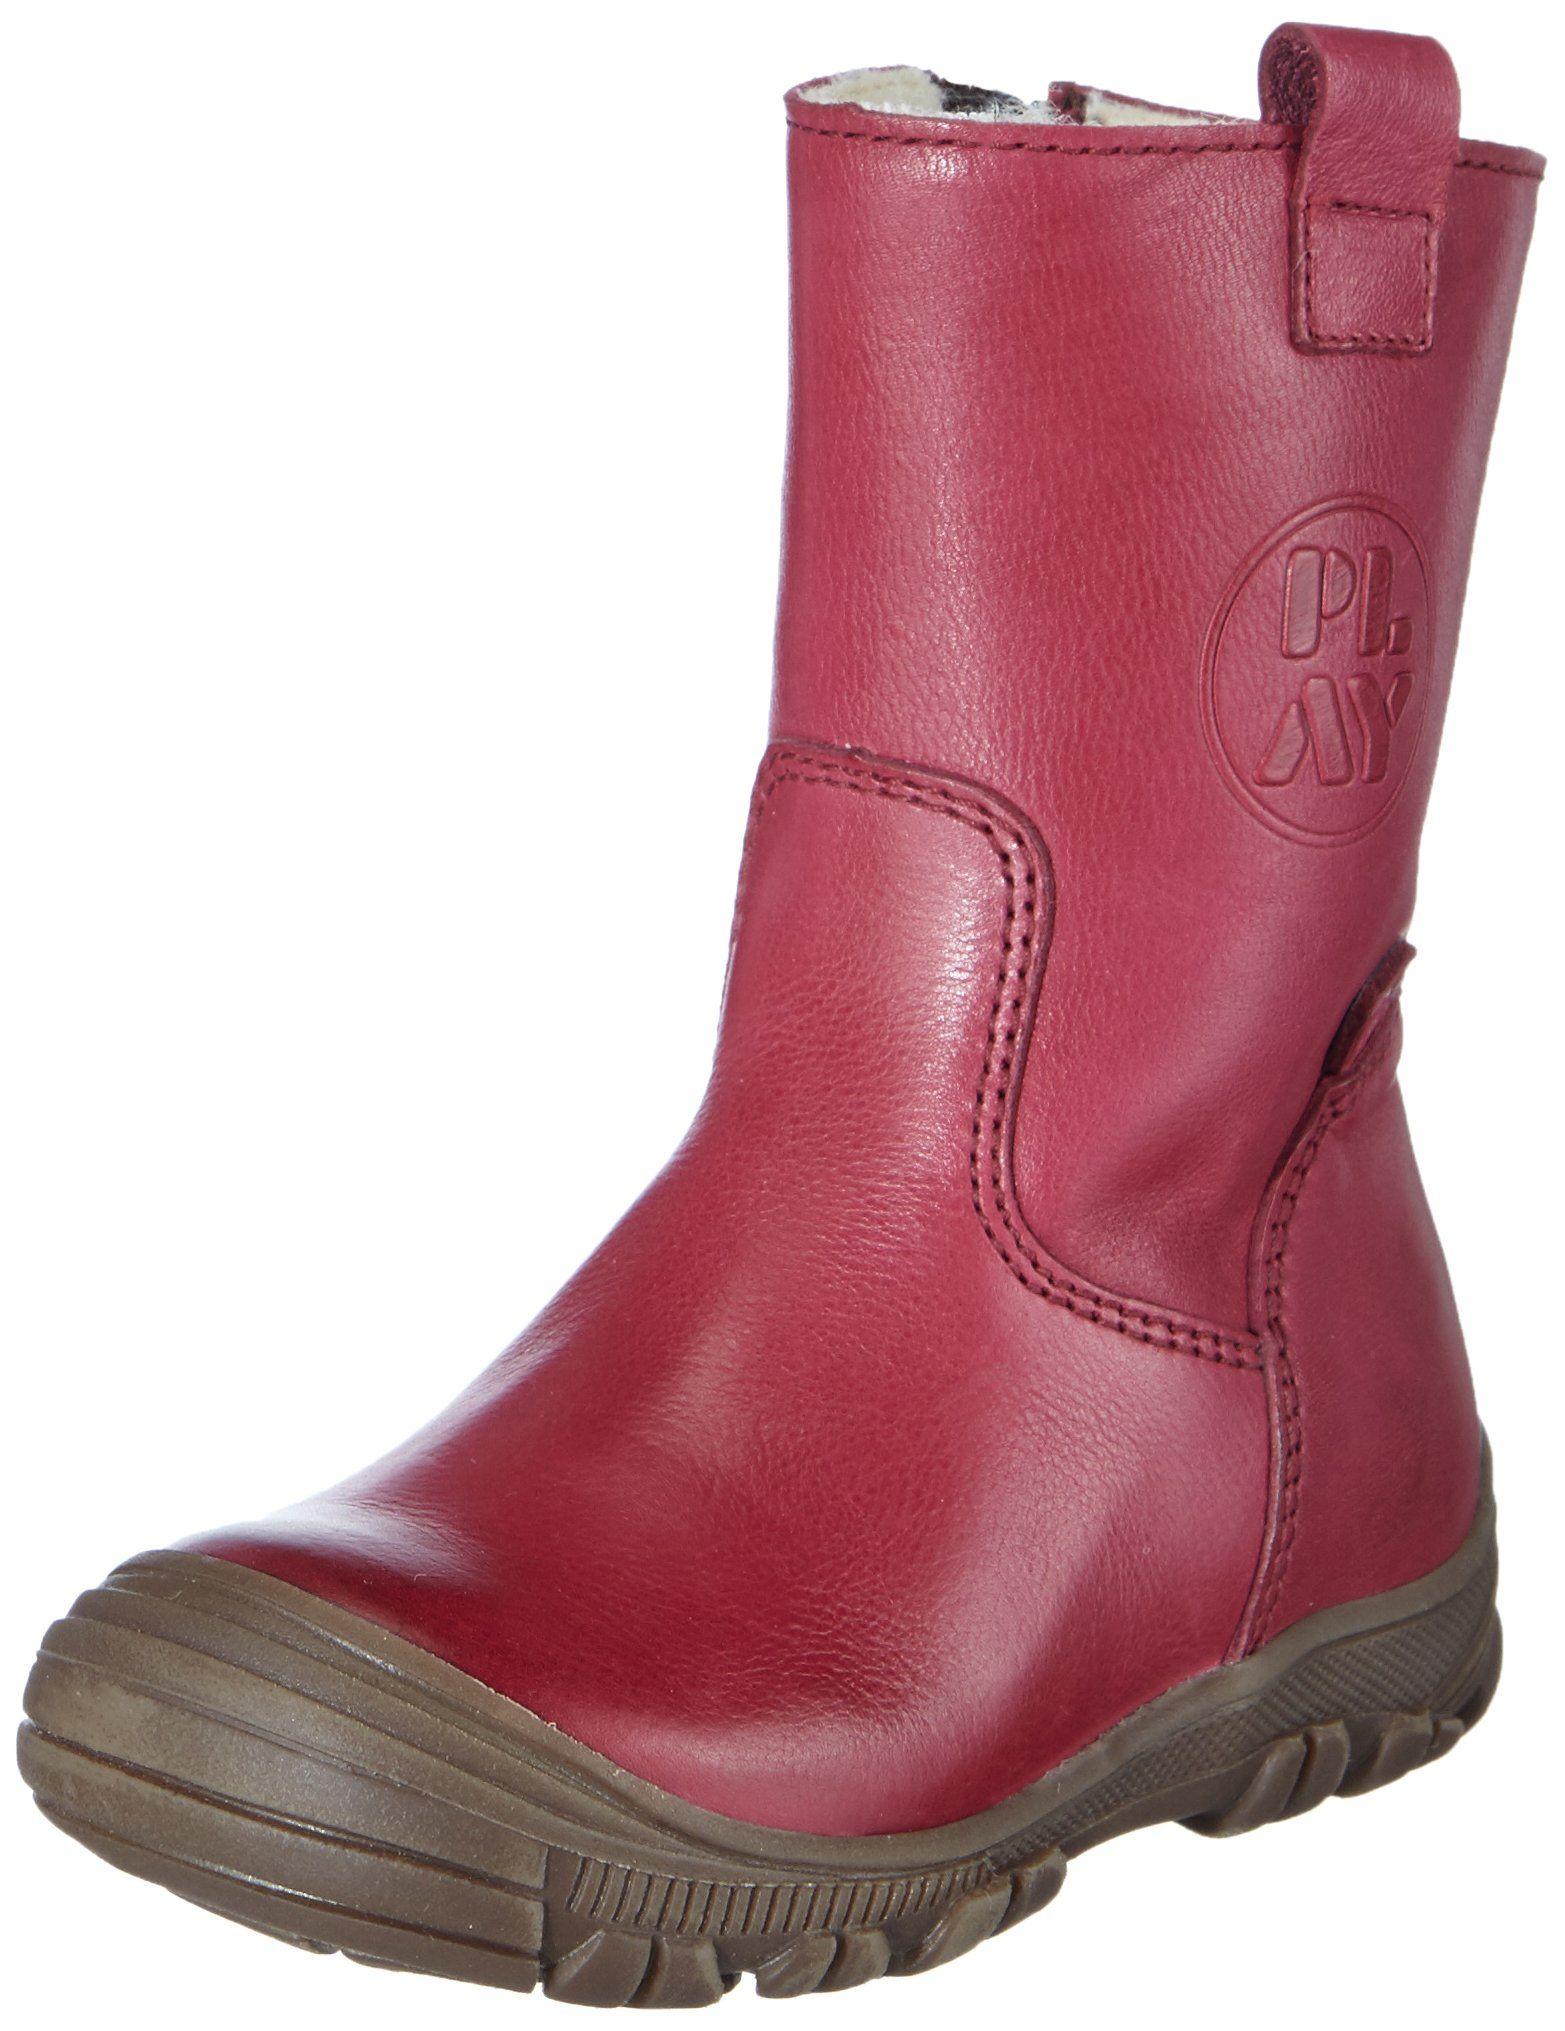 c49f213c3 Froddo Girls' Froddo Girls Warm lined snow boots half length, Red (wine), 8  Child UK: Amazon.co.uk: Shoes & Bags